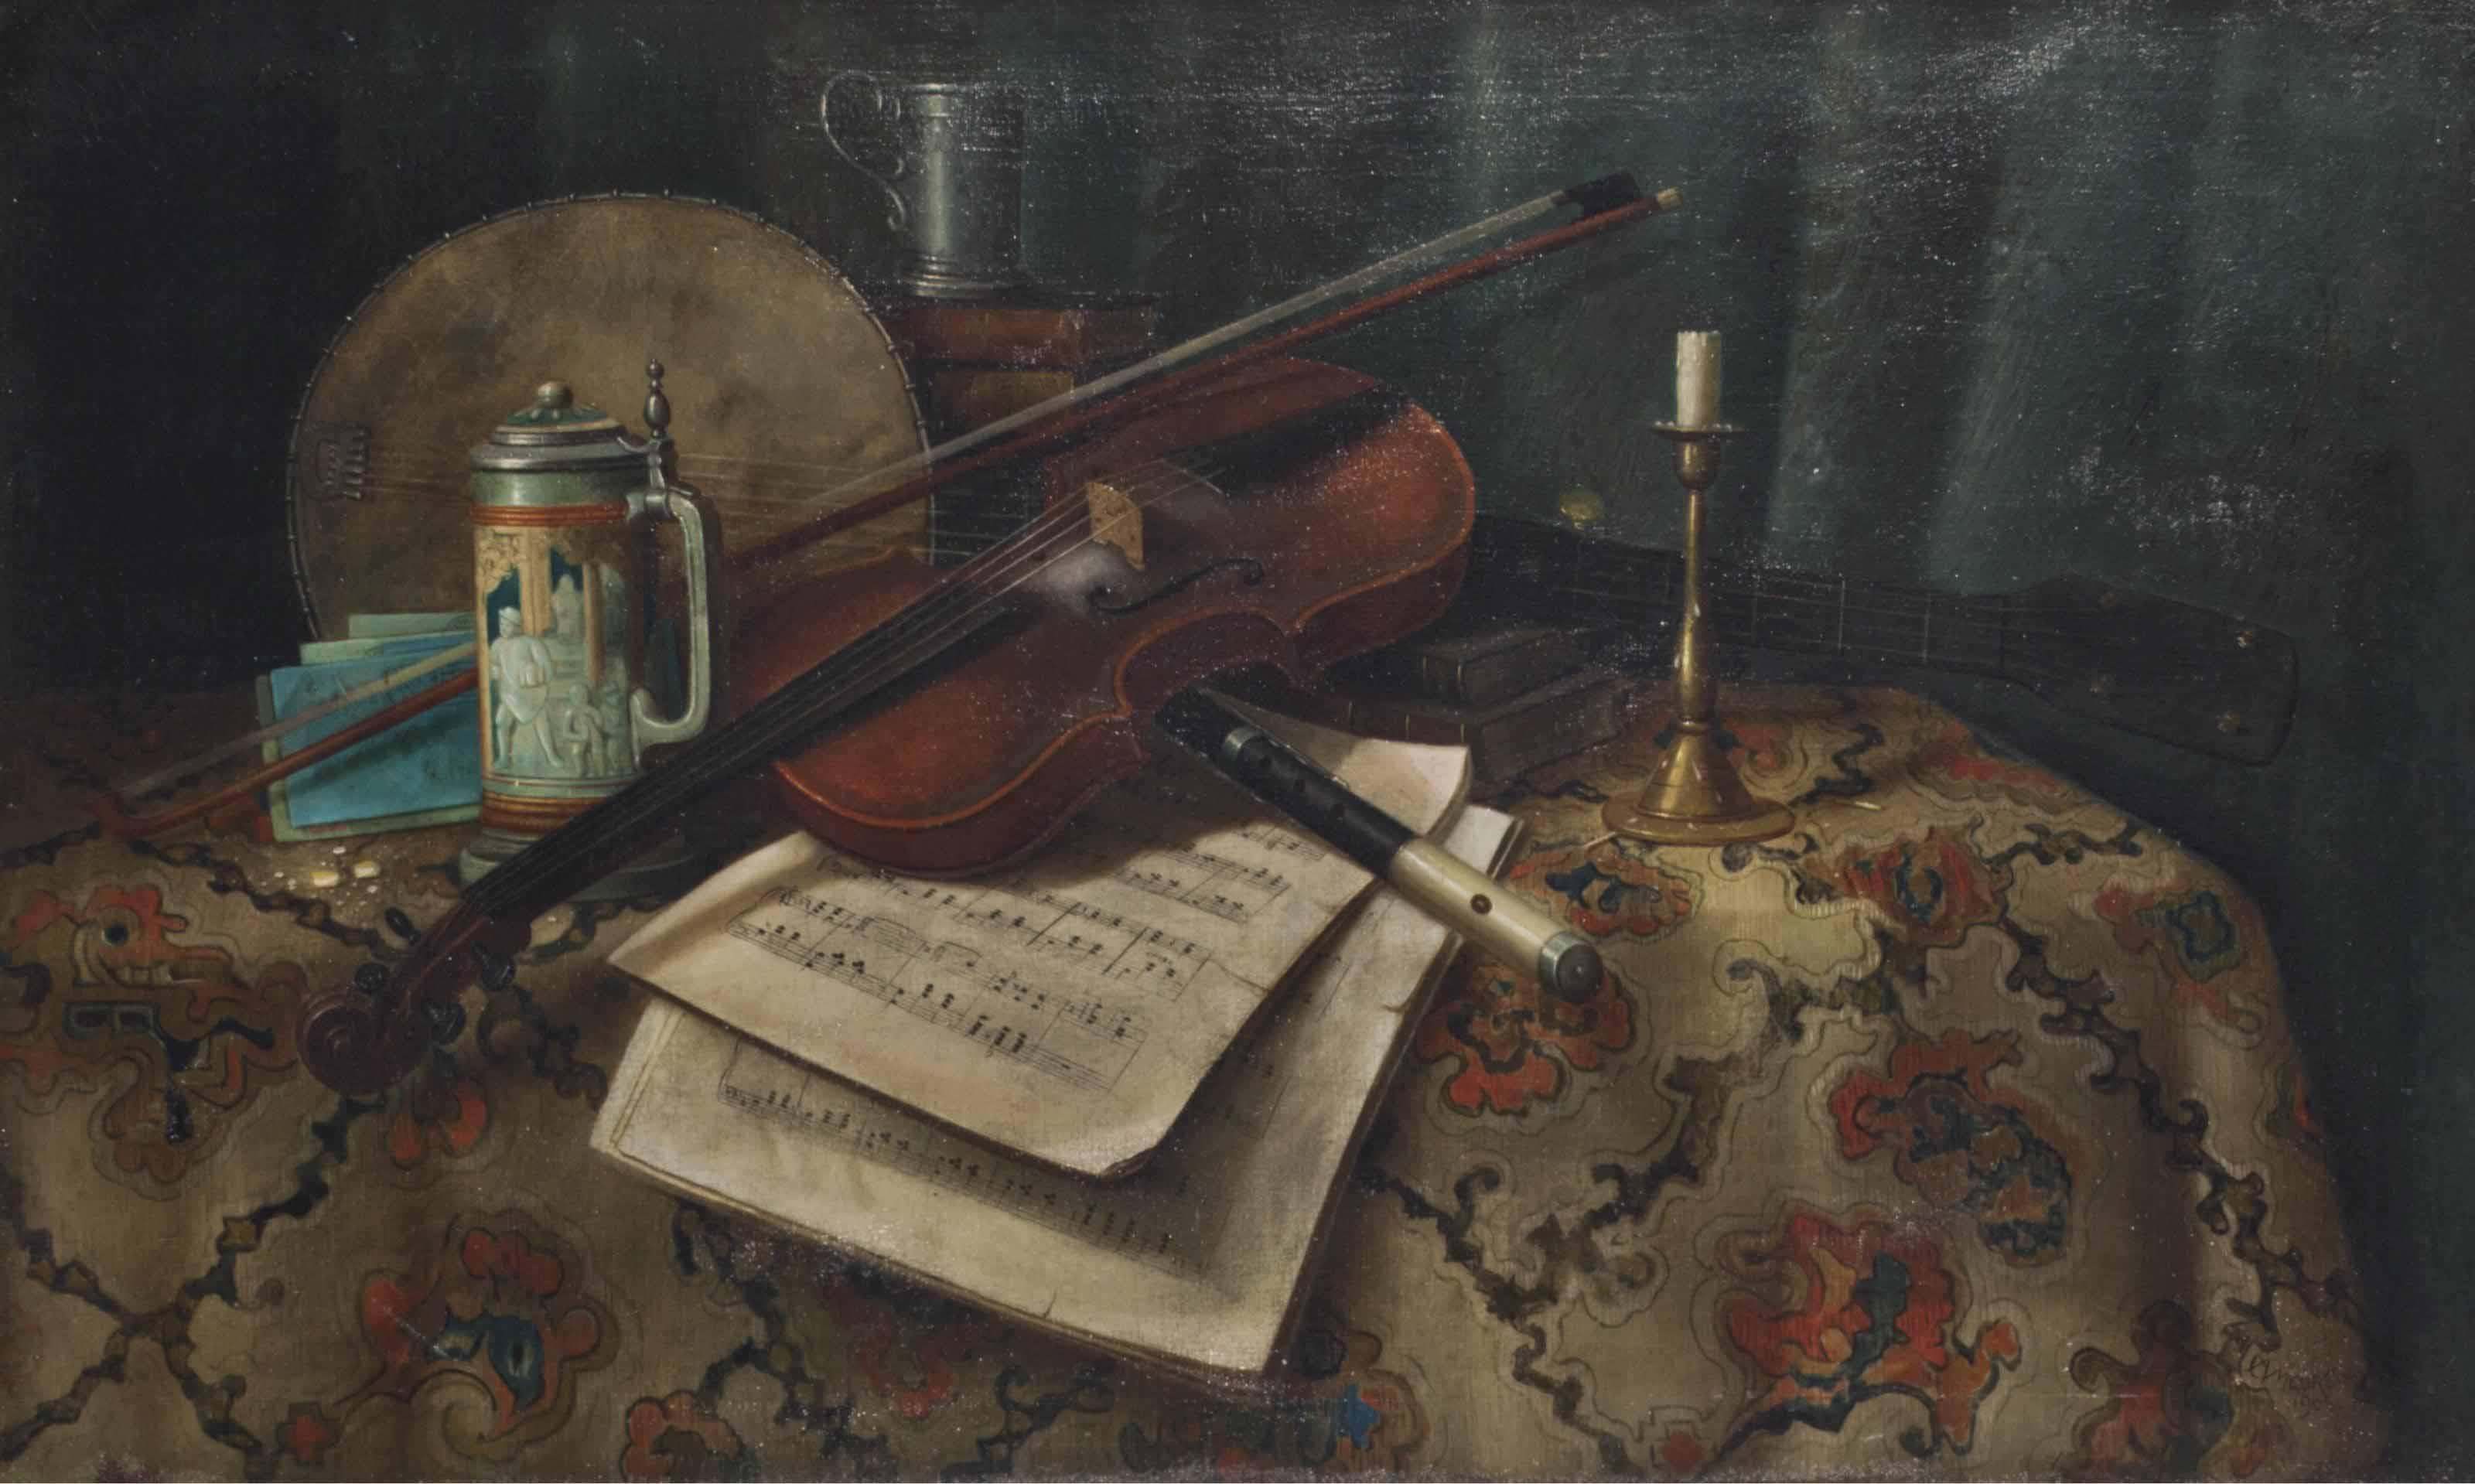 Still life with violin, flute and banjo